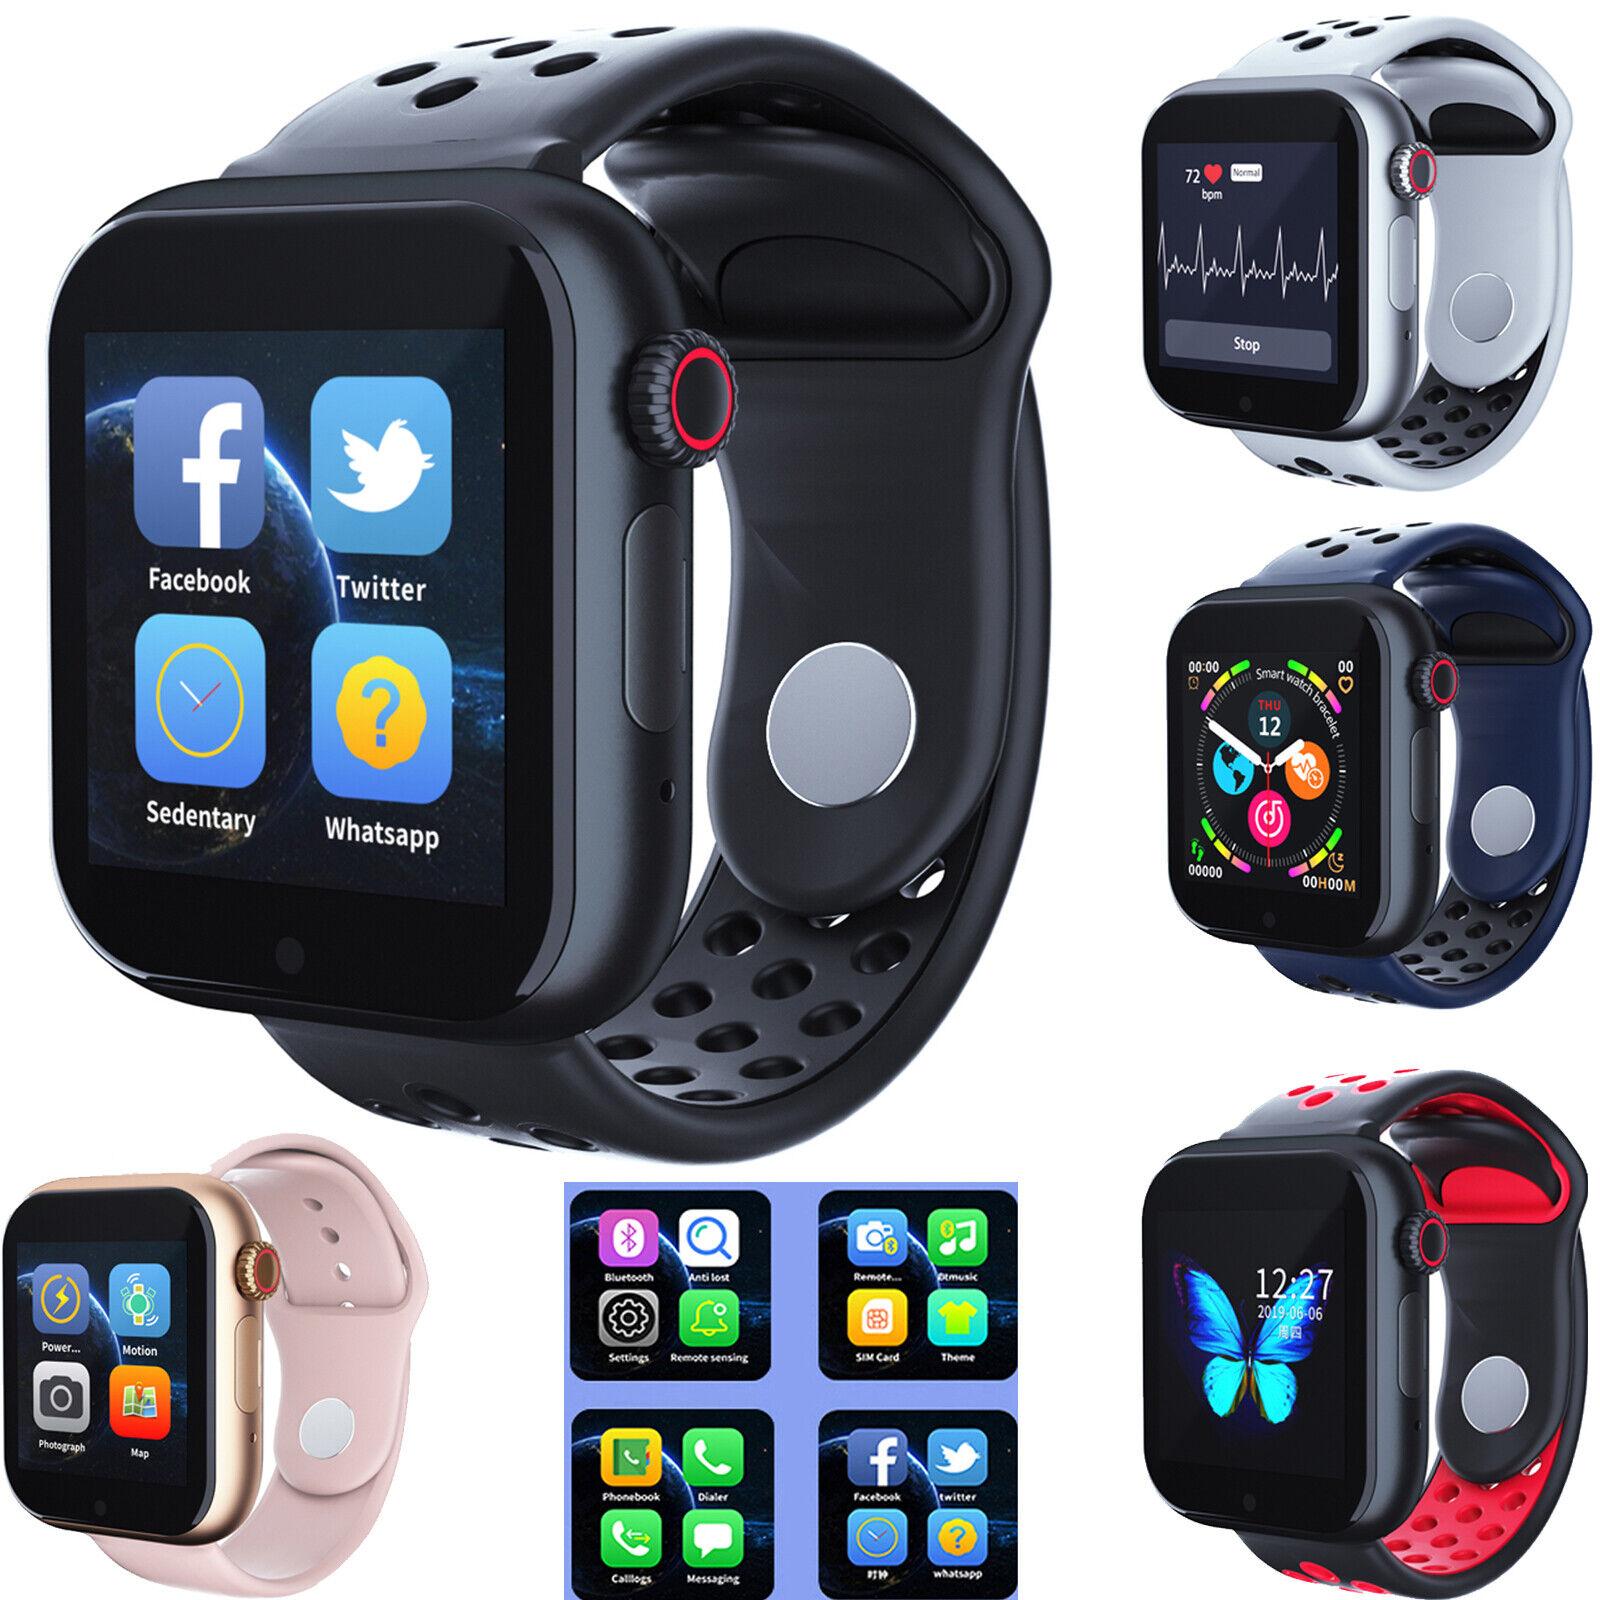 Bluetooth Smart Watch Phone GSM SIM Heart Rate Sleep Monitor Sports Wristwatch bluetooth Featured gsm heart monitor phone rate sim sleep smart watch